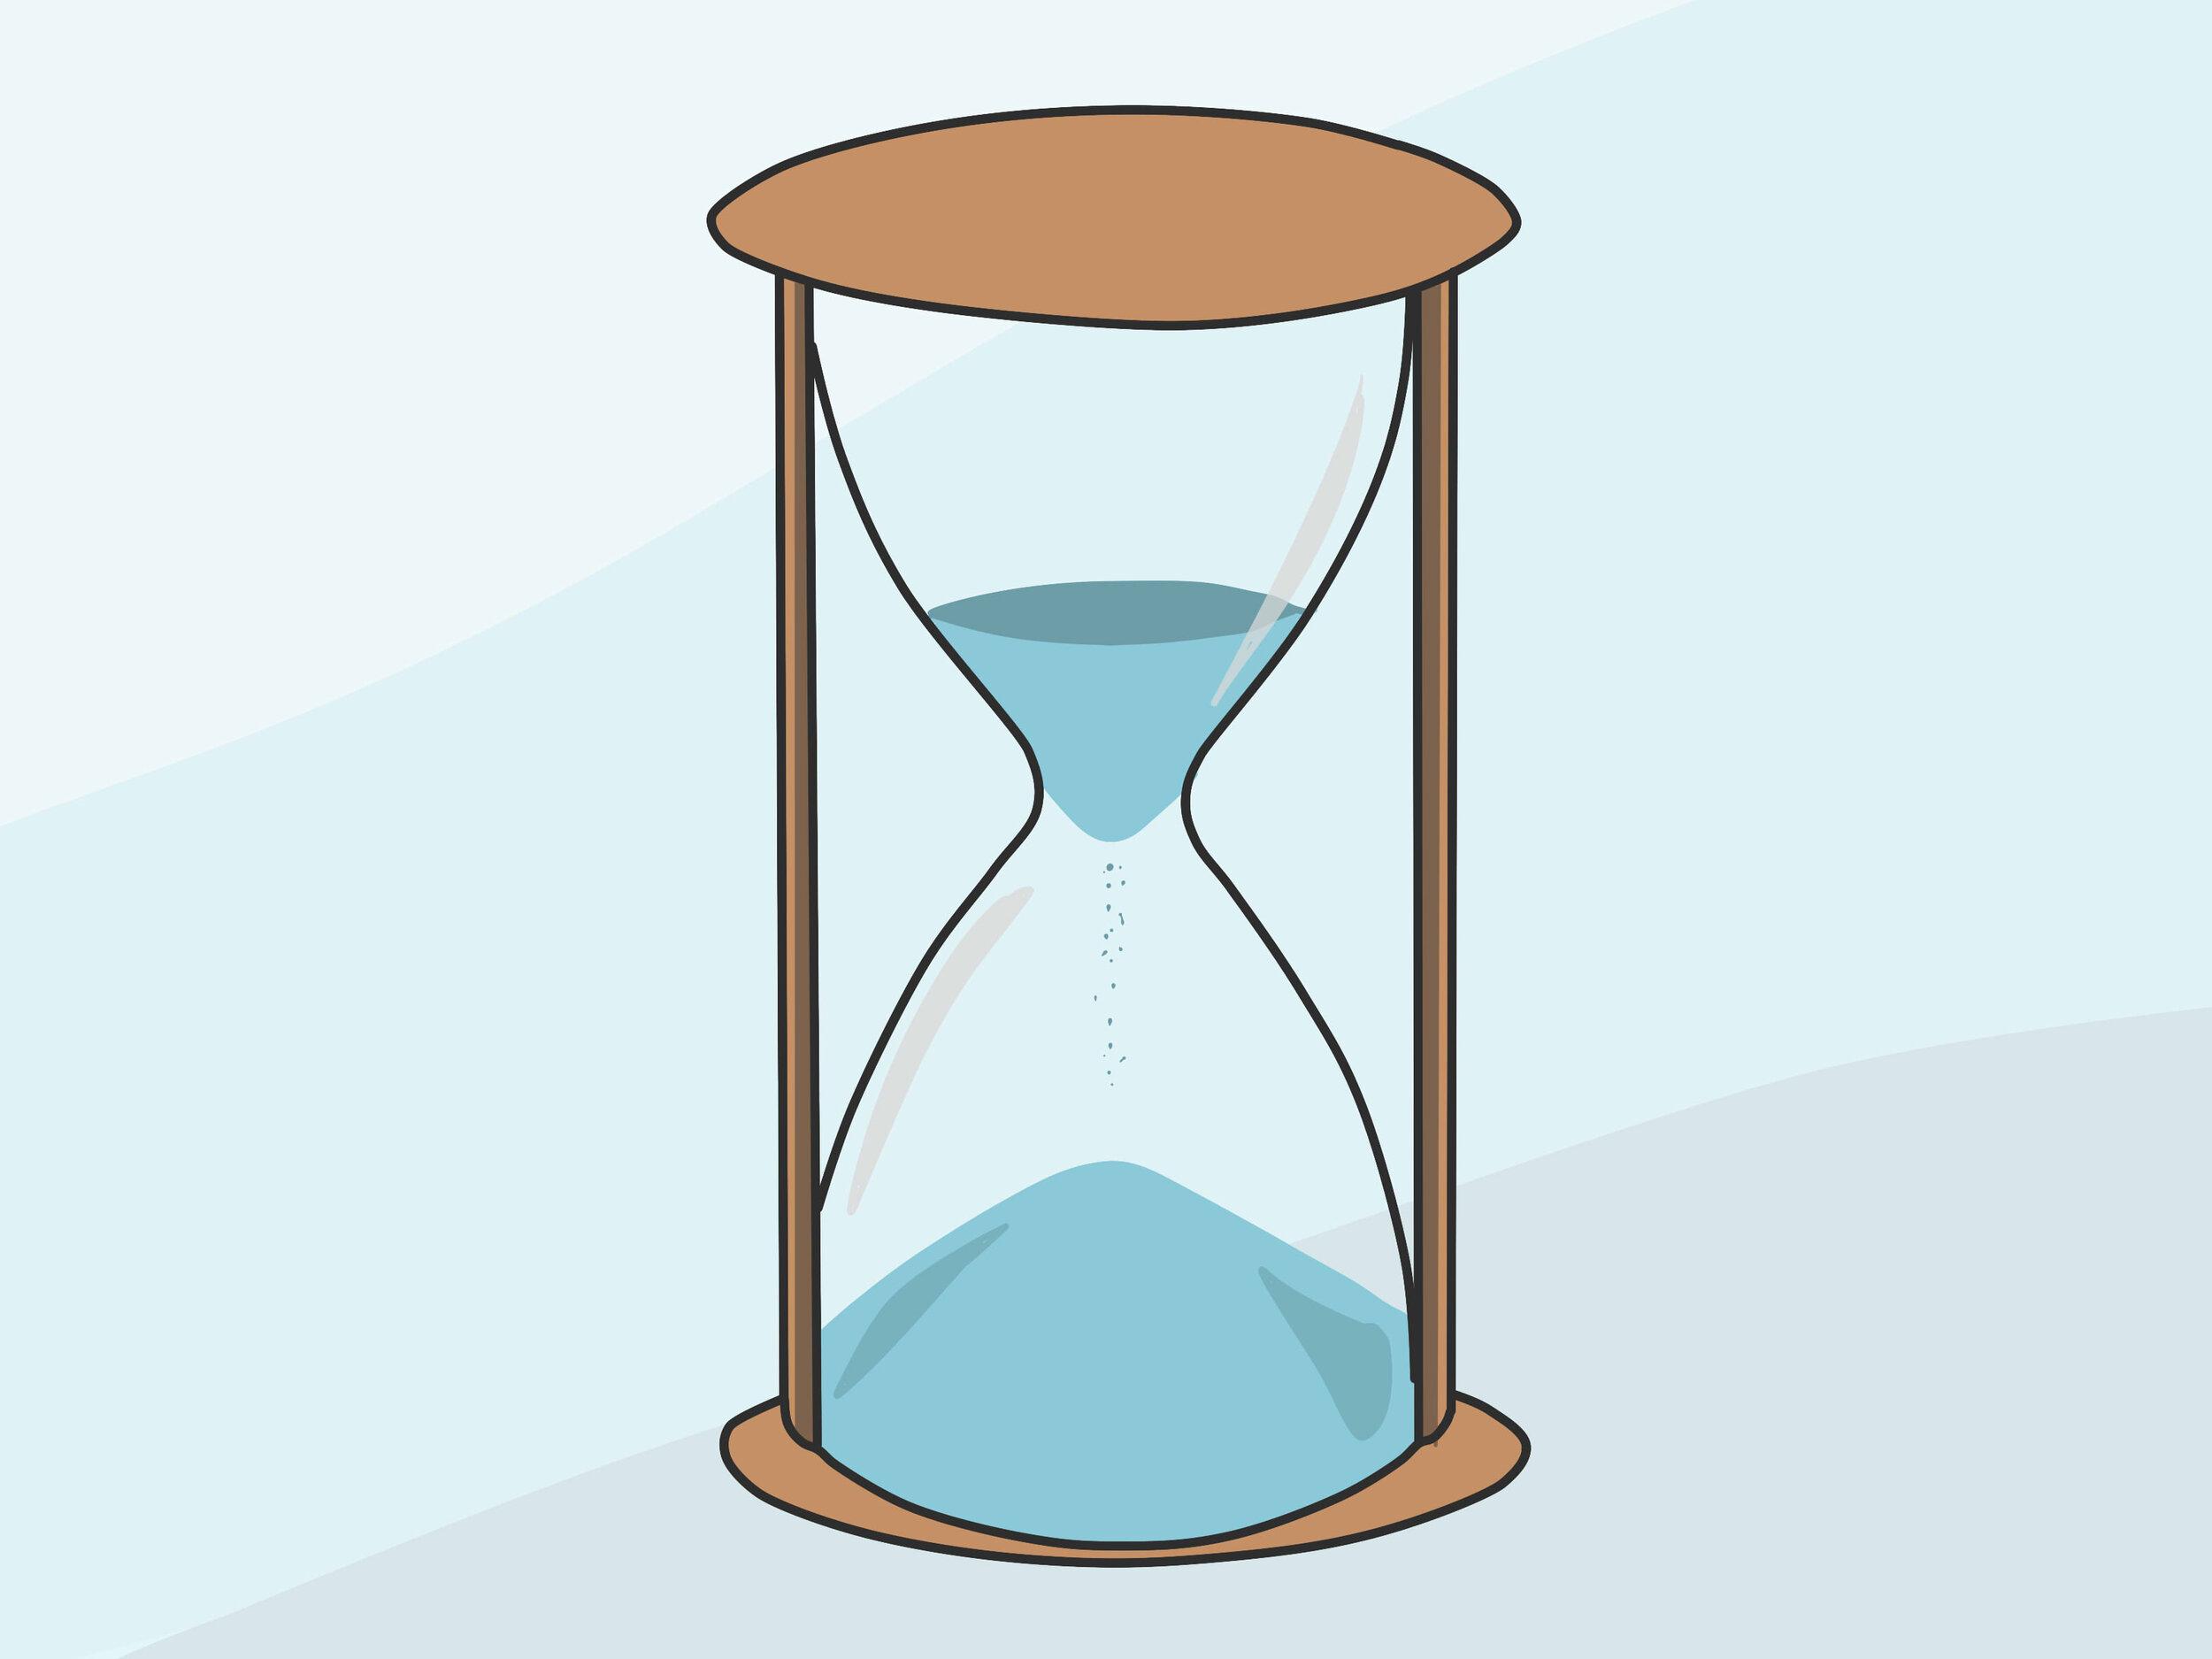 Draw-an-Hourglass-Step-15.jpg